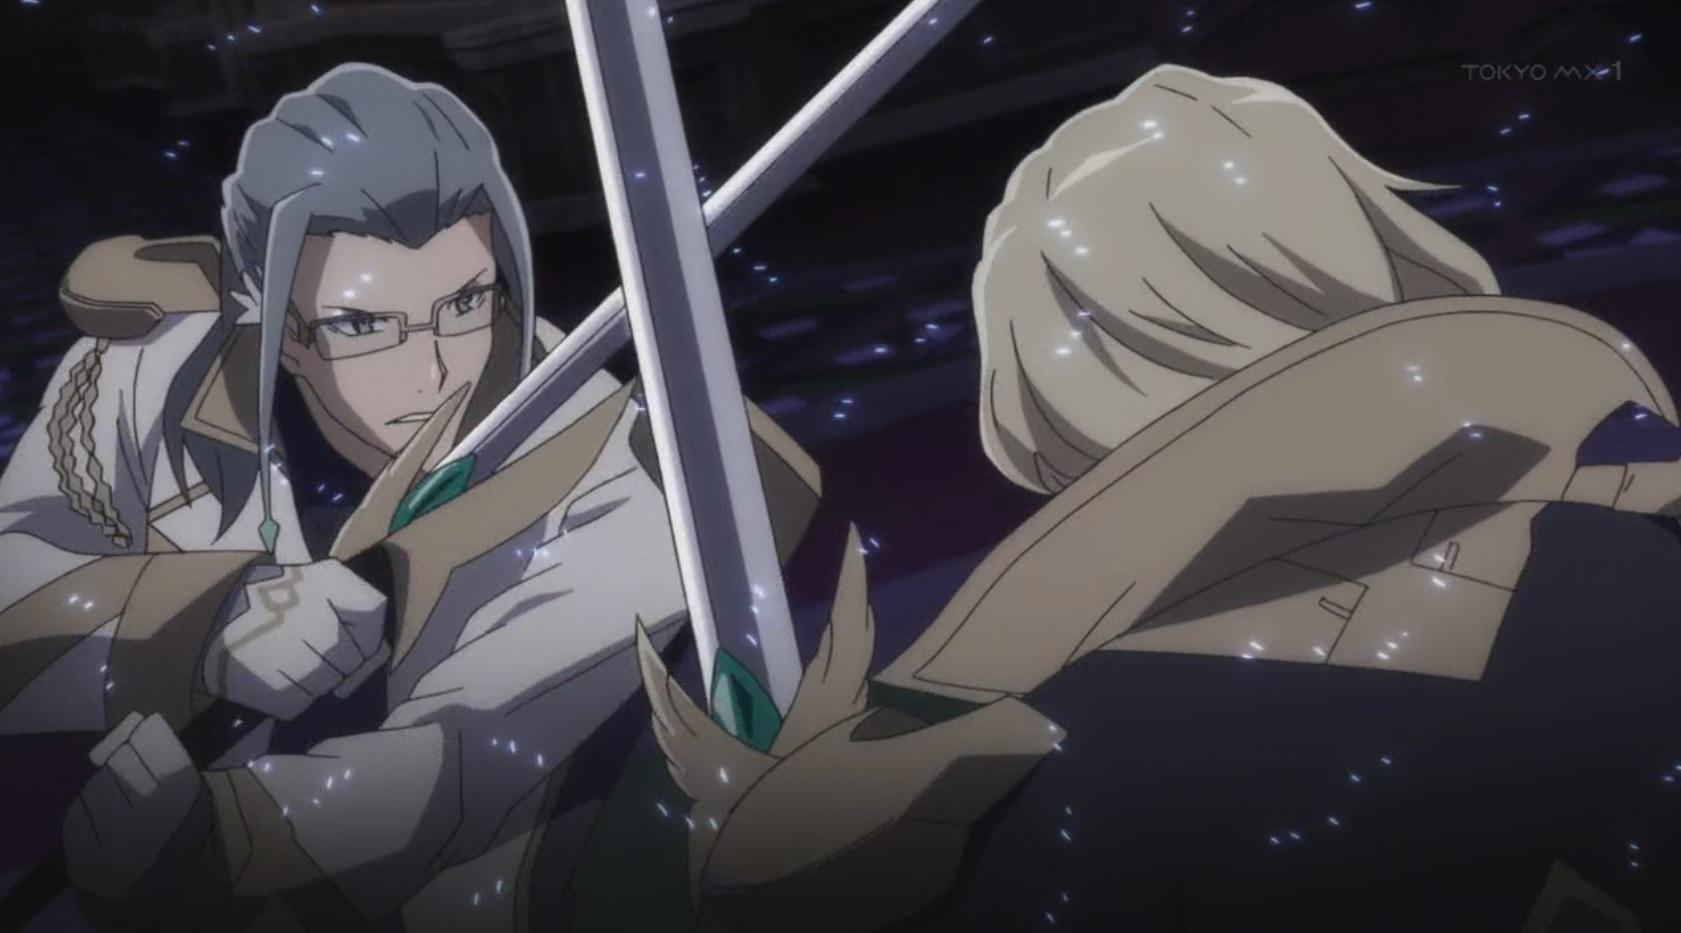 Roid versus White Knight